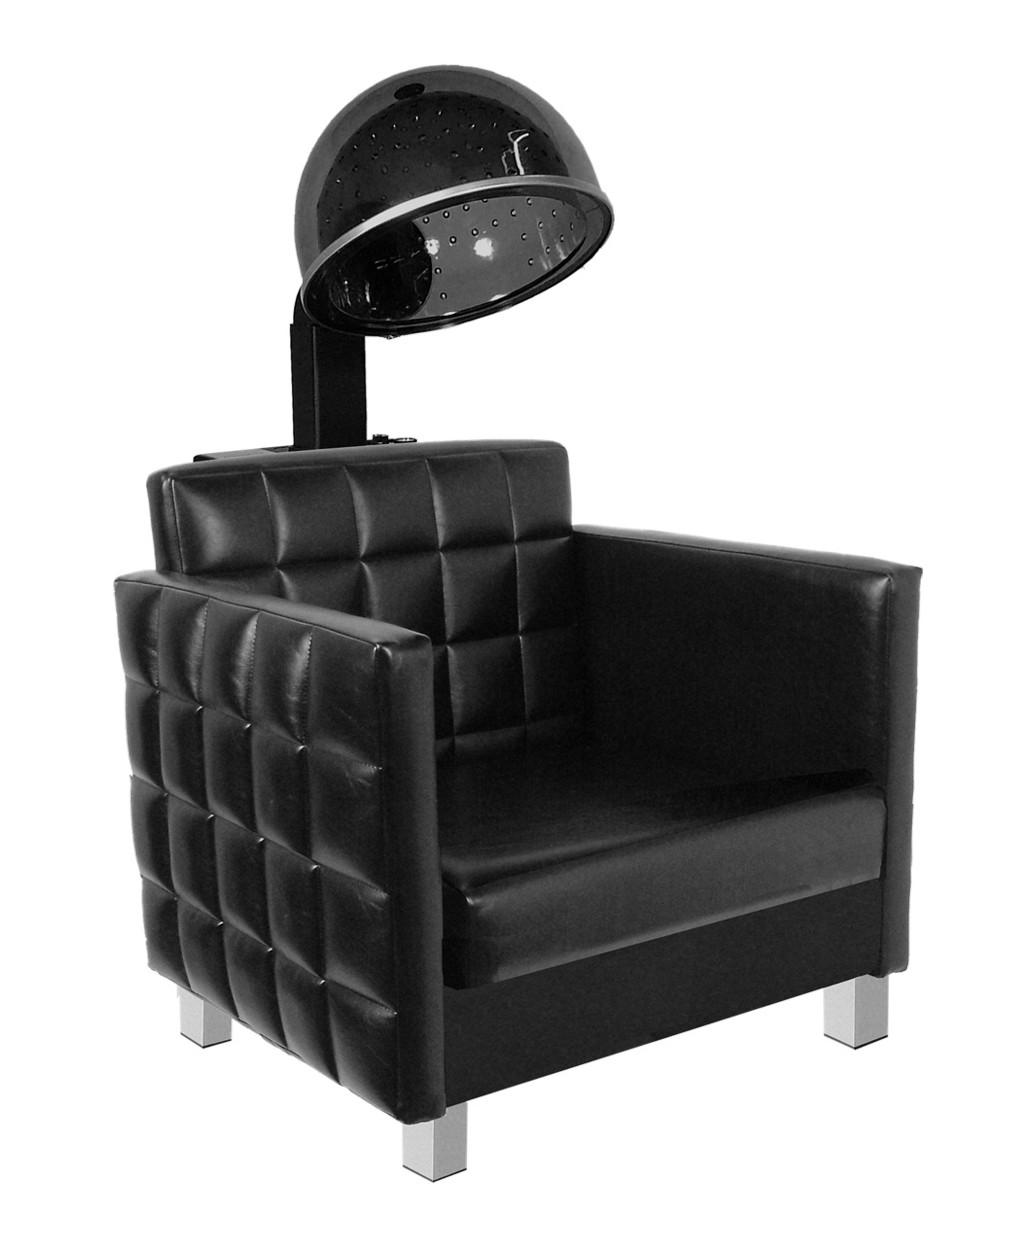 Dryer Chairs collins 6820 nouveau dryer chair